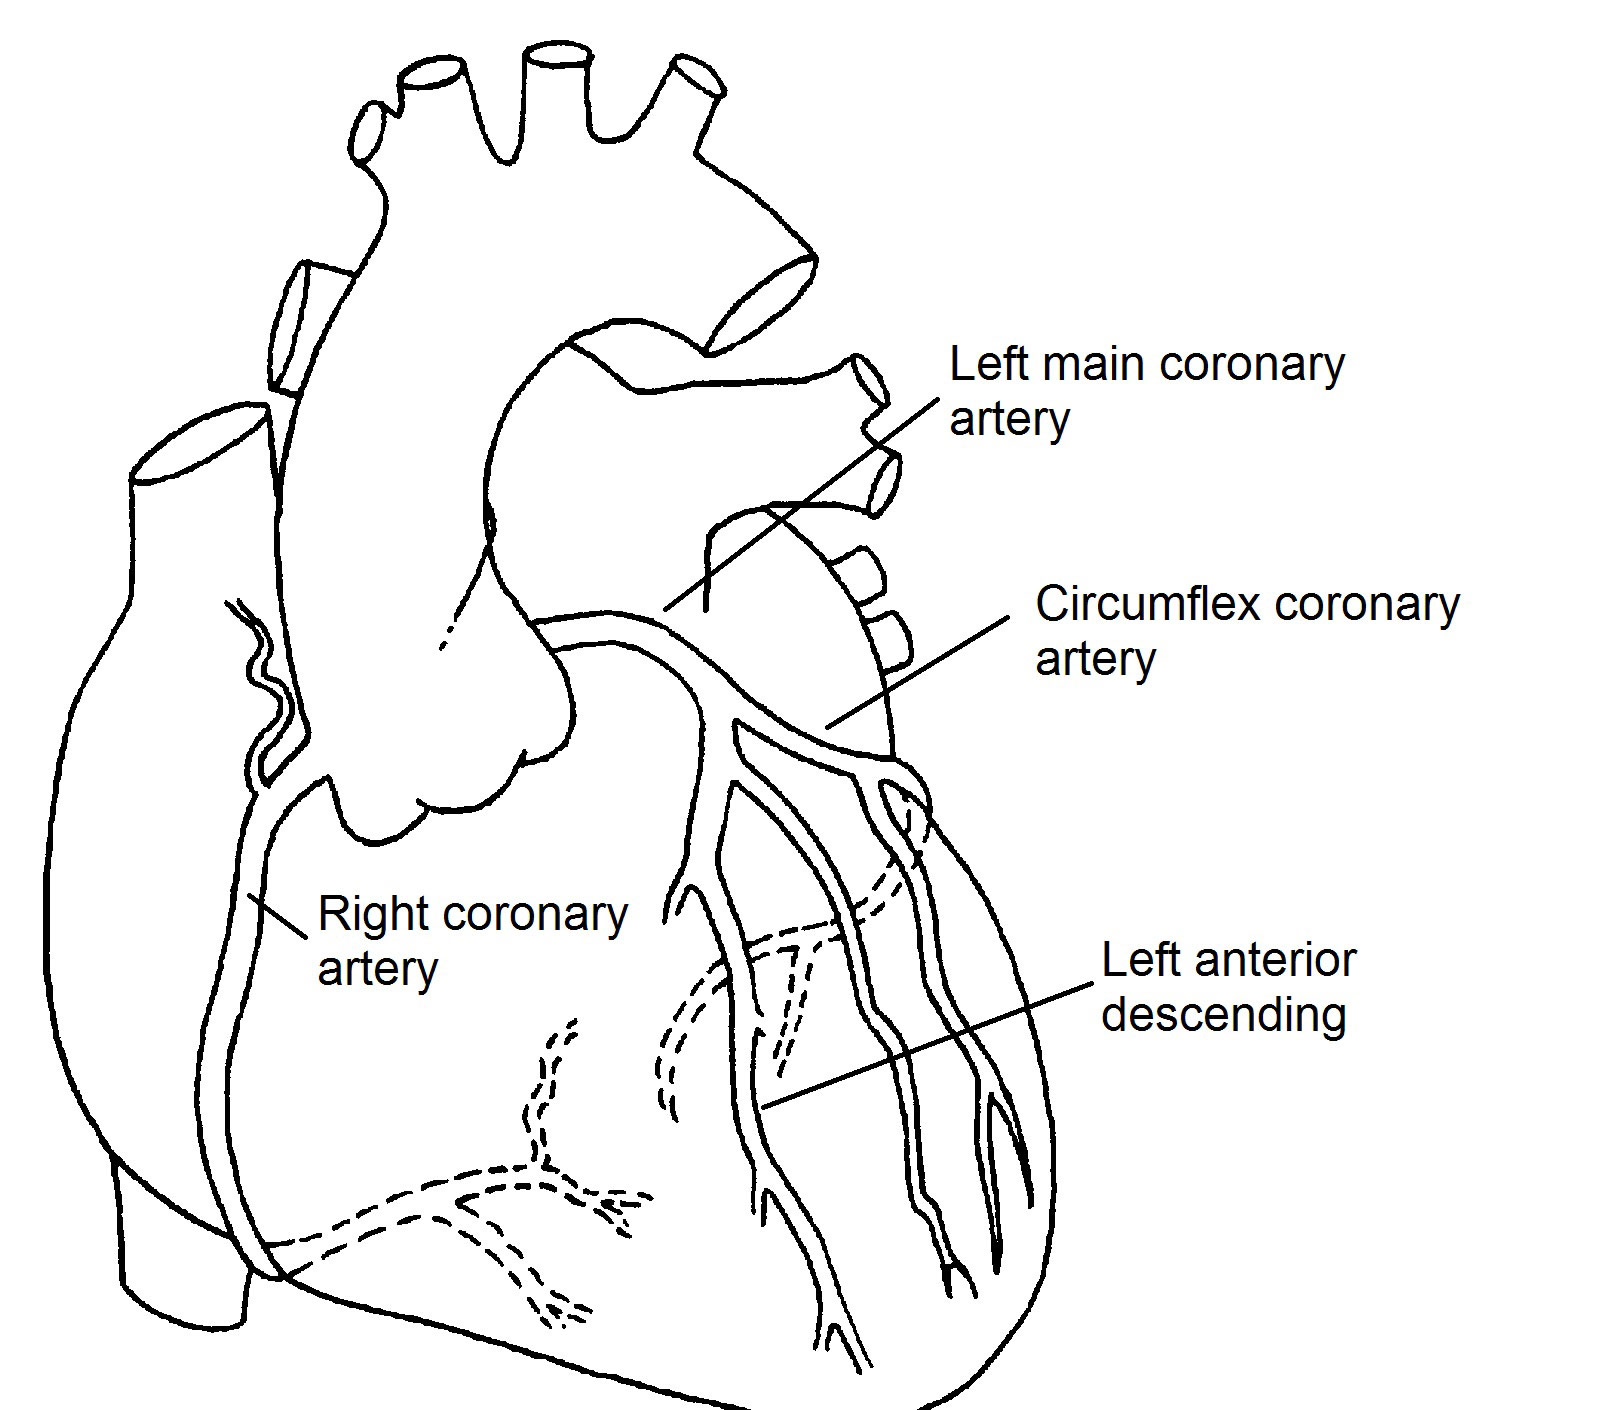 coronary arteries diagram branches 1993 honda accord wiring radio normal pediatric heart specialists